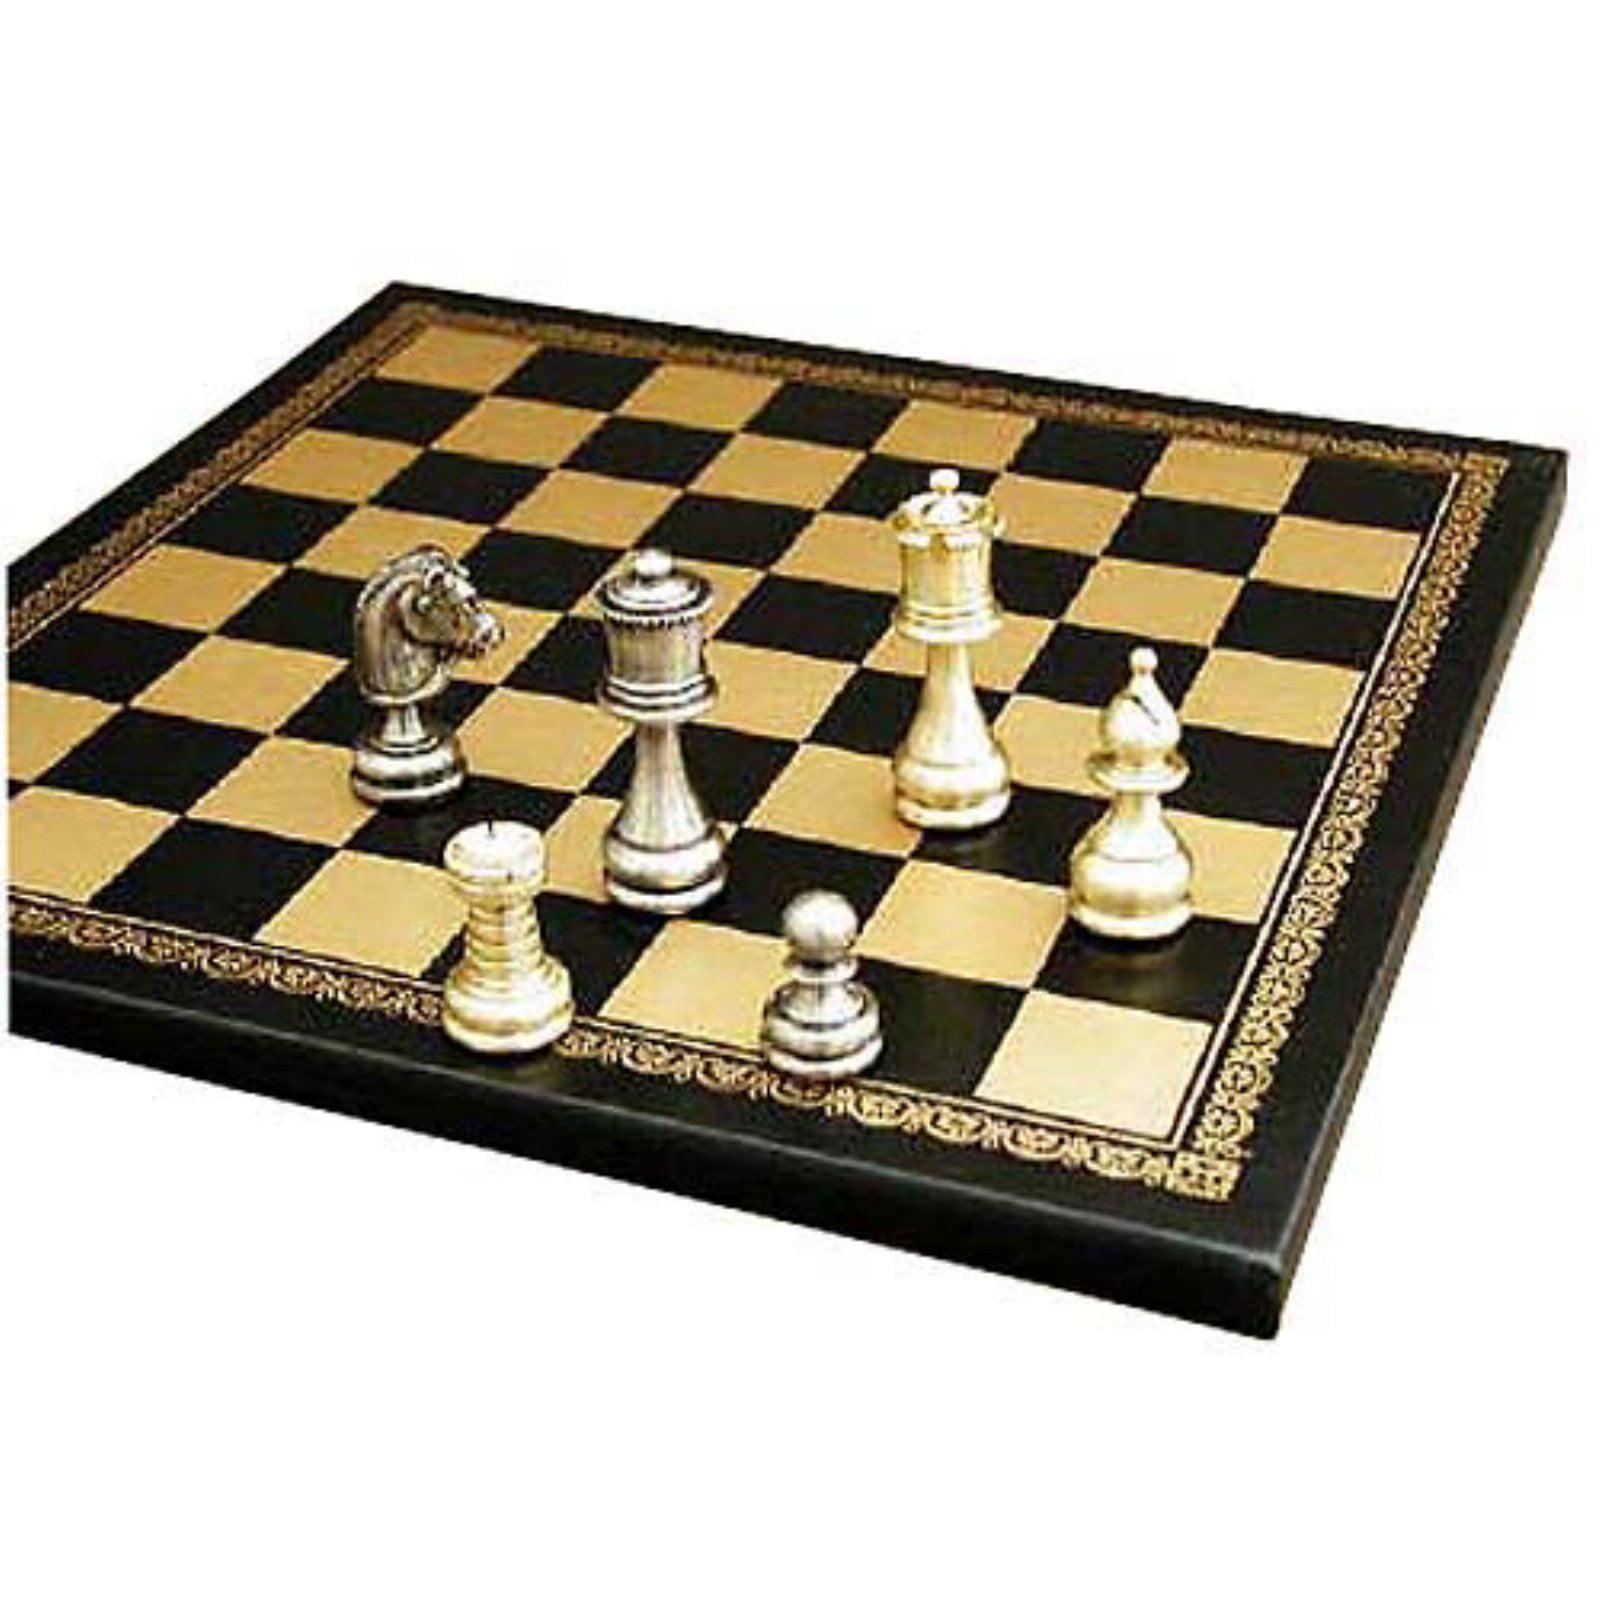 Large Staunton Chess Set by